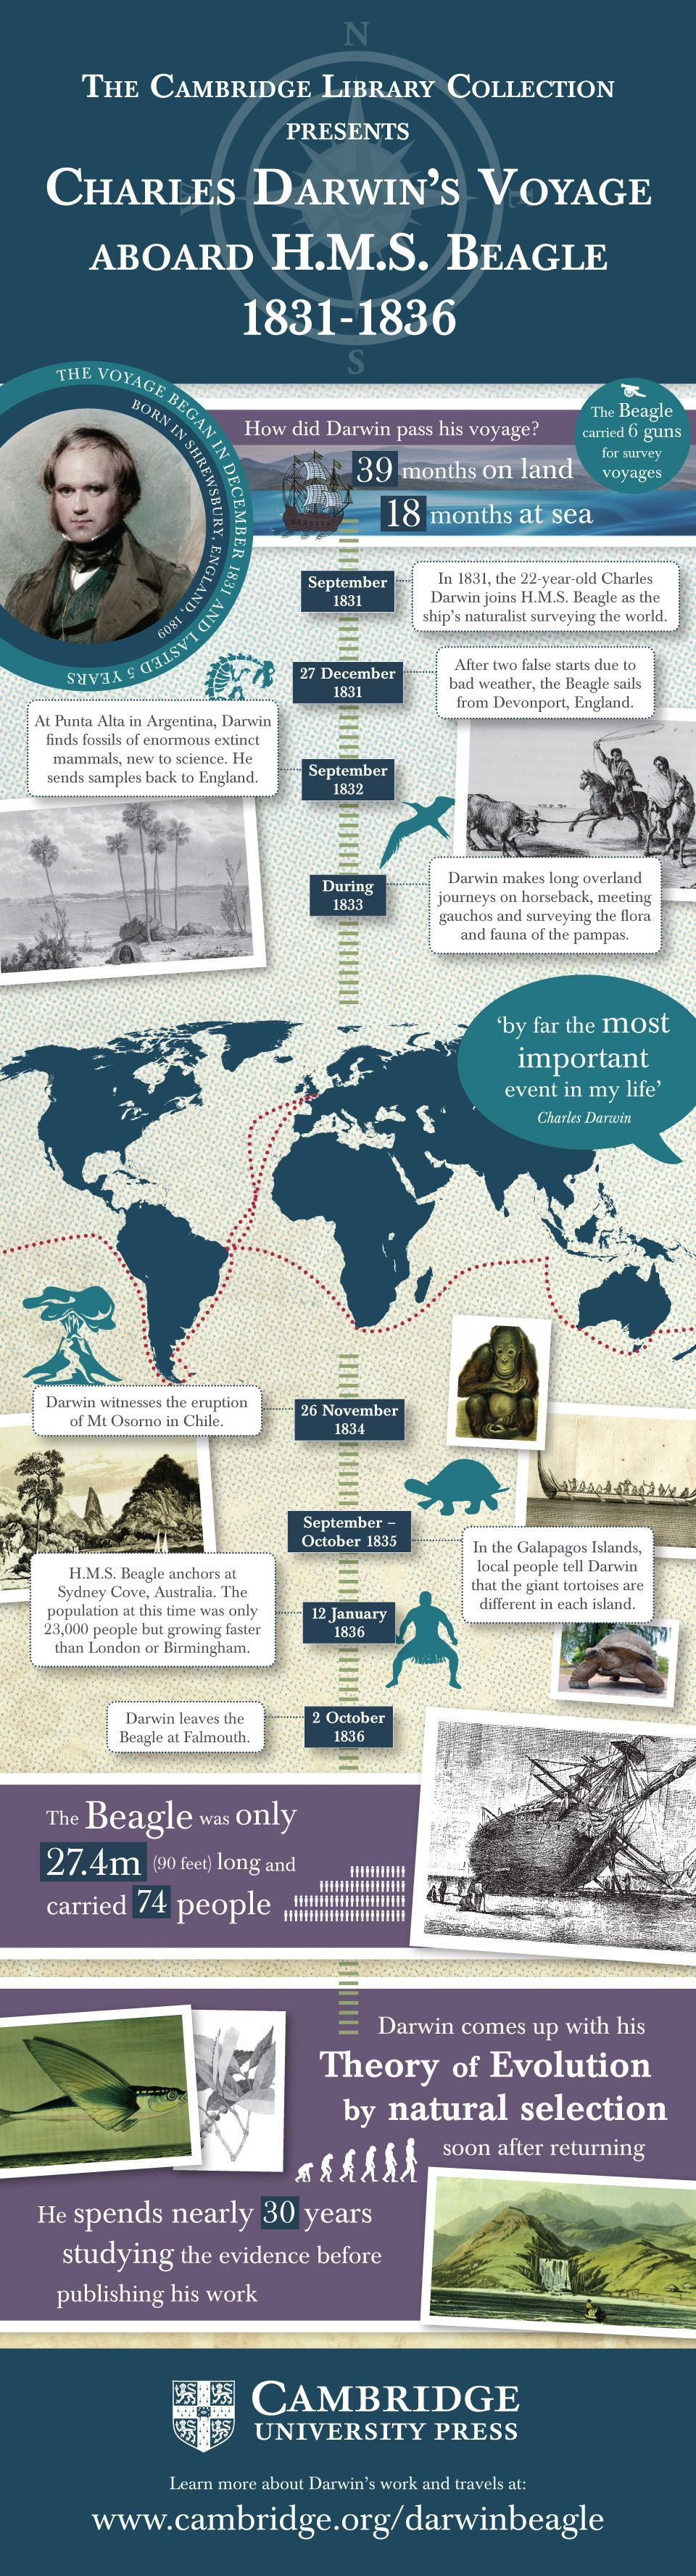 Infographic detailing Charles Darwin's voyage aboard HMS Beagle